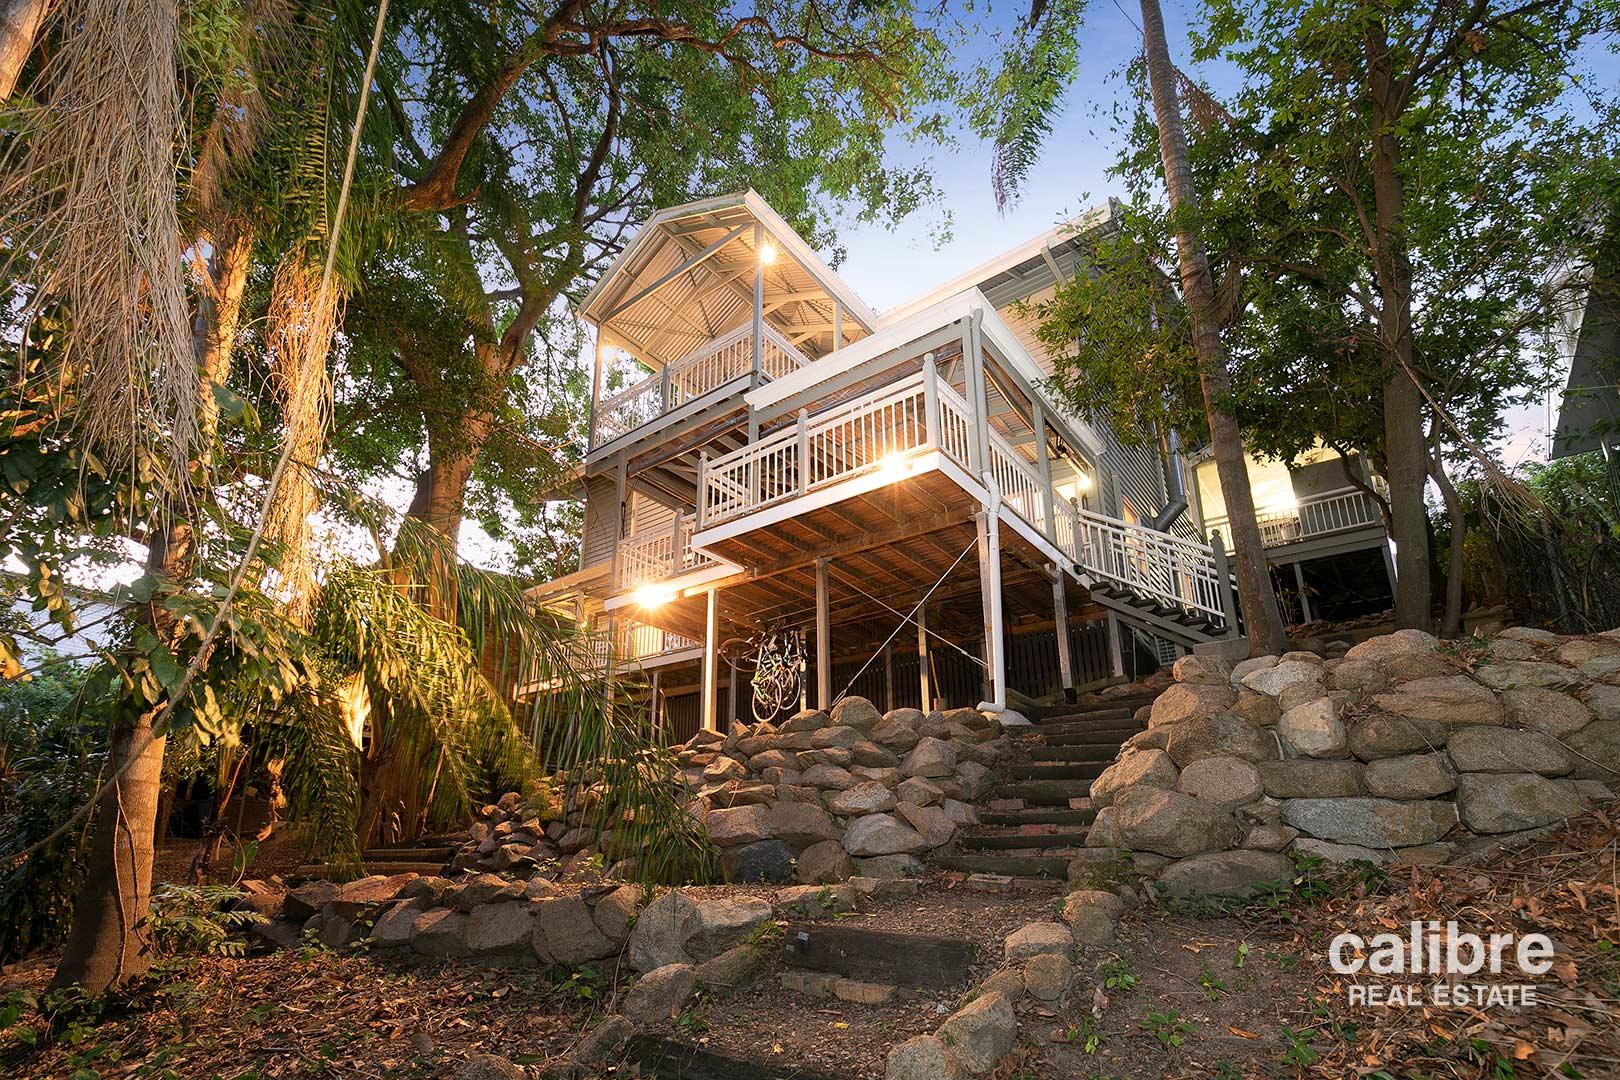 120 Simpsons Road, Bardon_Calibre Real Estate, Brisbane_Justin Hagen (12)